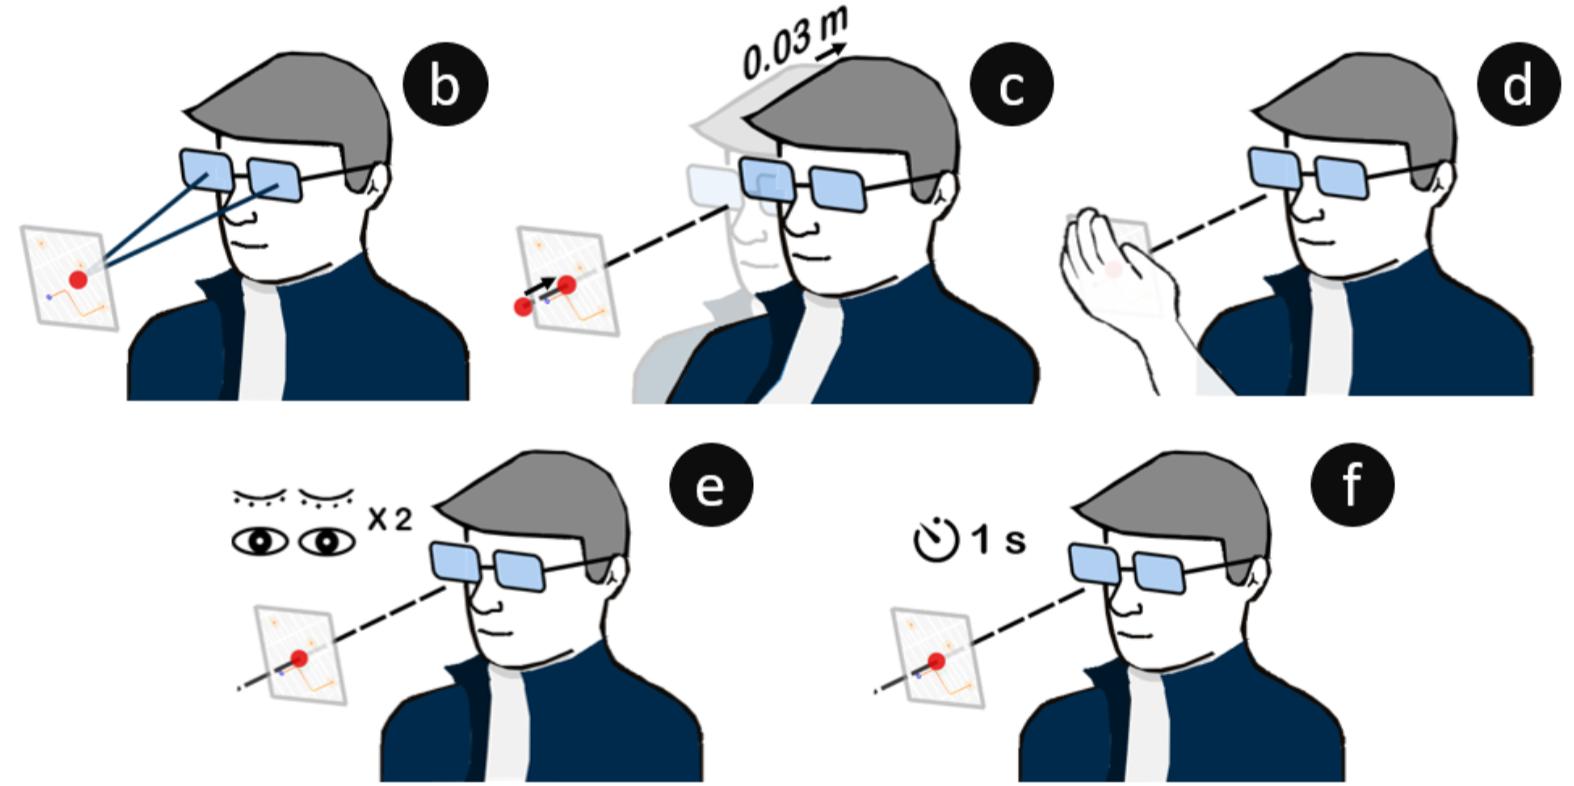 Glanceable AR: Exploration of Techniques for Rapid Activation of Glanceable Information